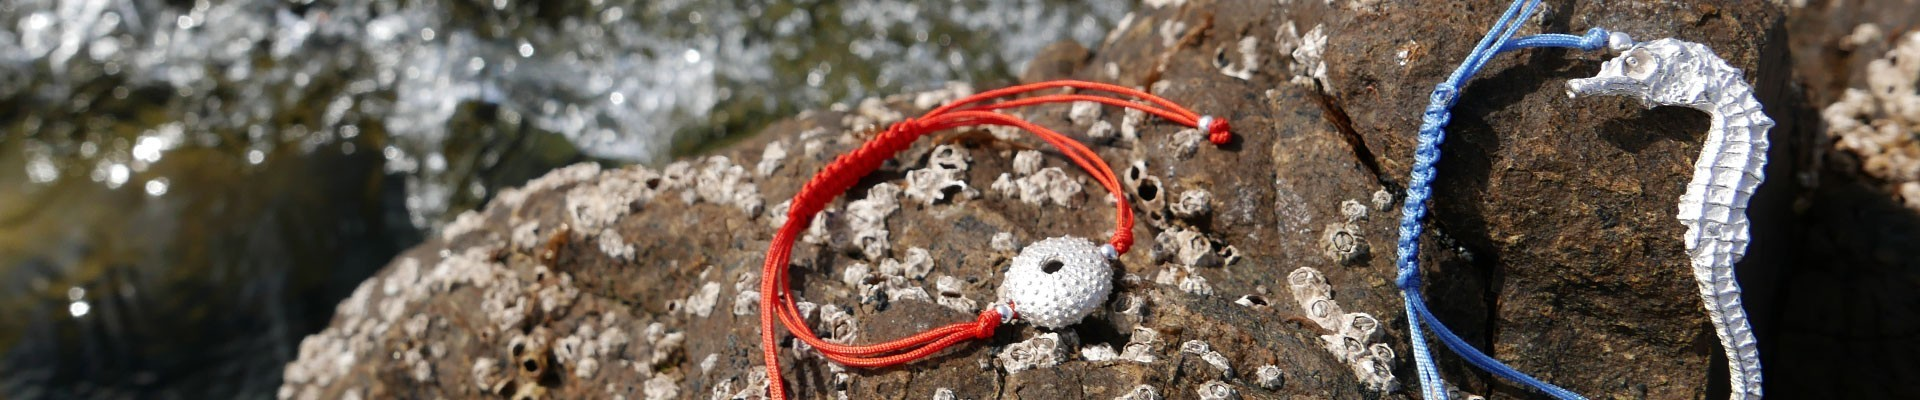 Bracelets | Pitiua.com